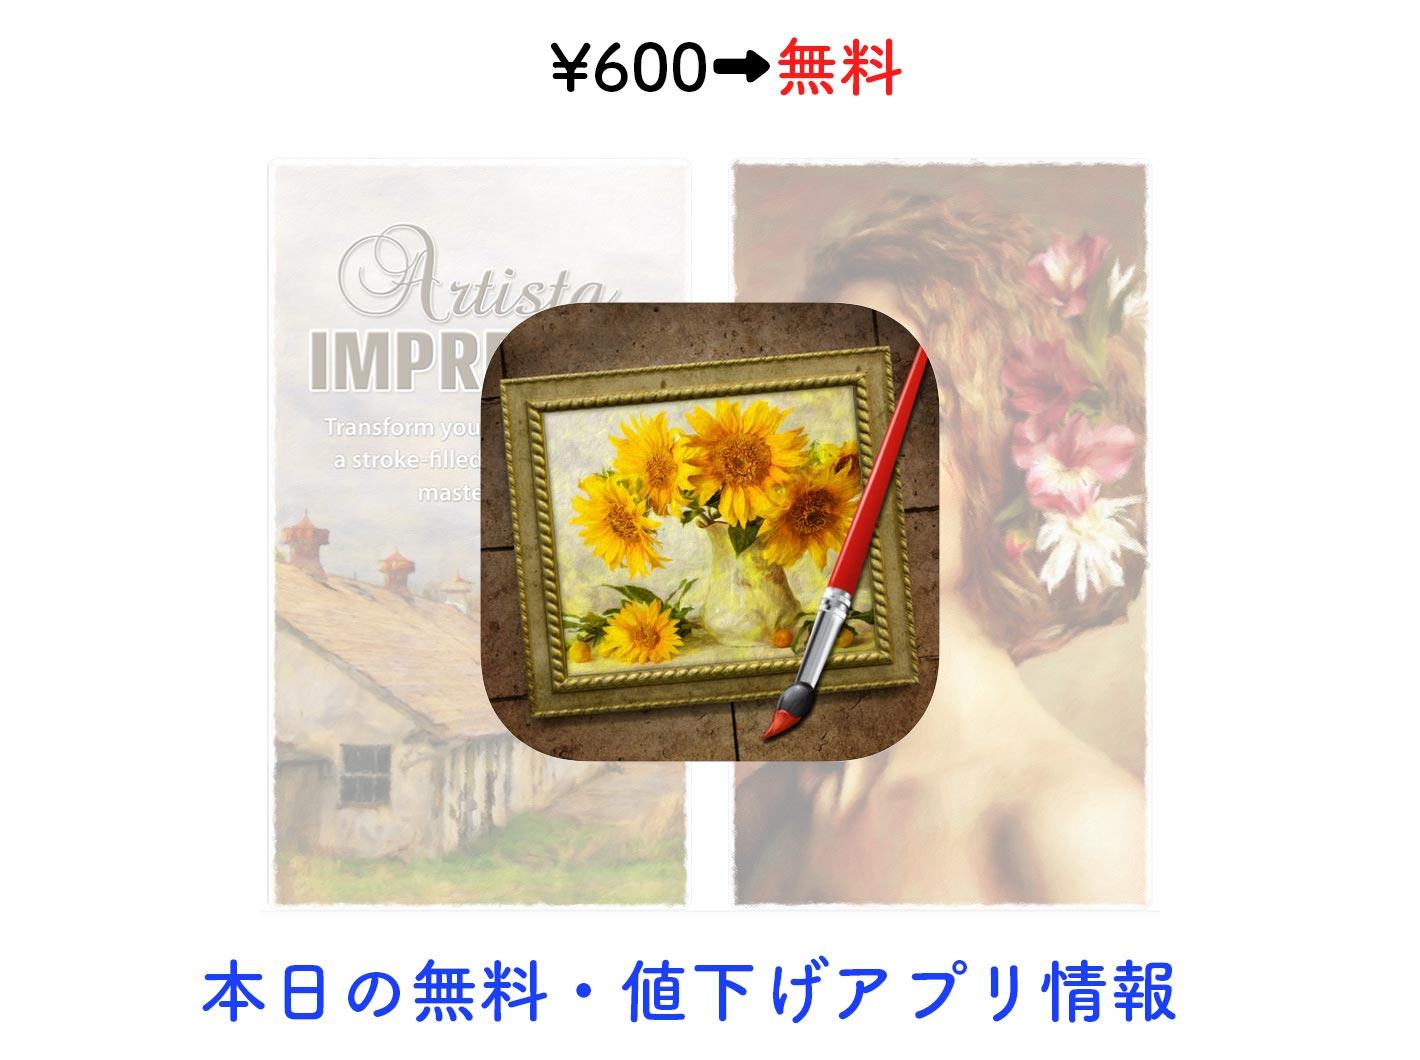 Appsale0702